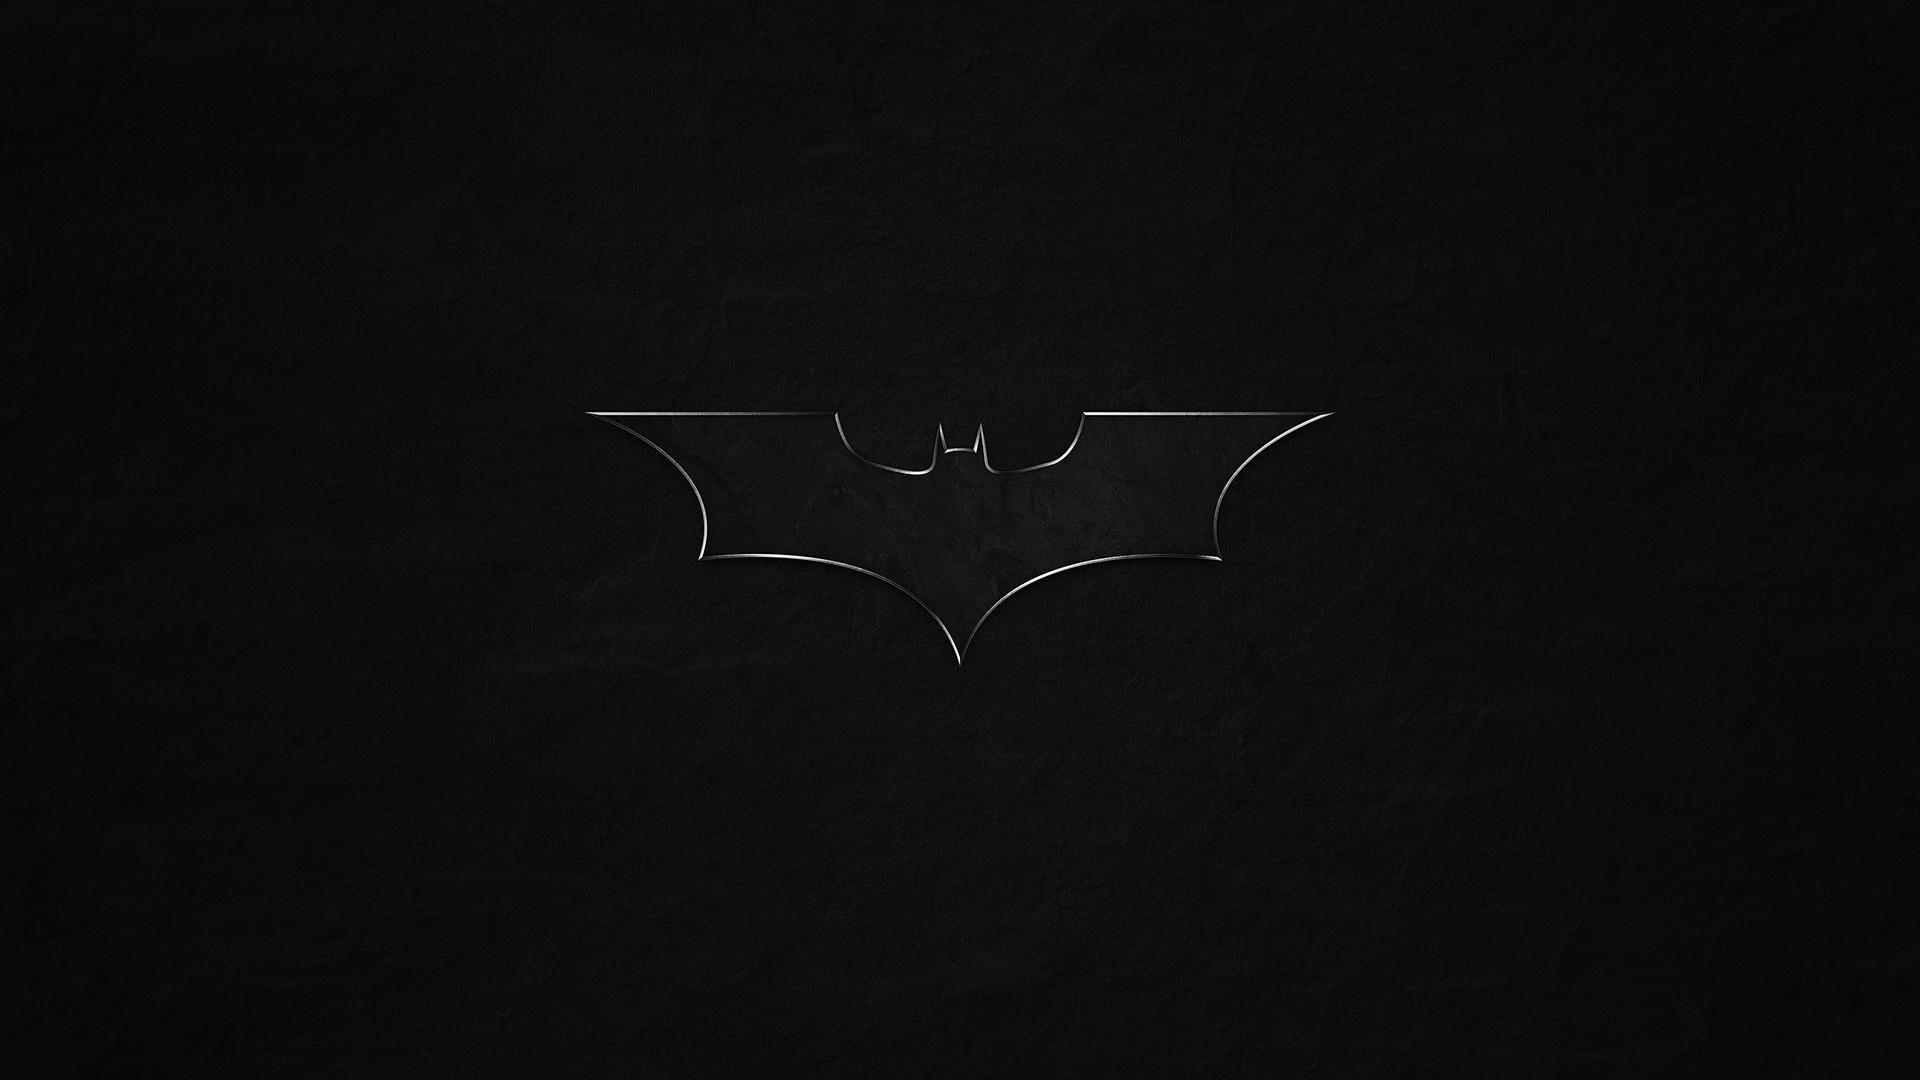 Cool Wallpaper Mac Batman - 1089525-vertical-batman-symbol-wallpaper-1920x1080-for-mac  Best Photo Reference_56249.jpg